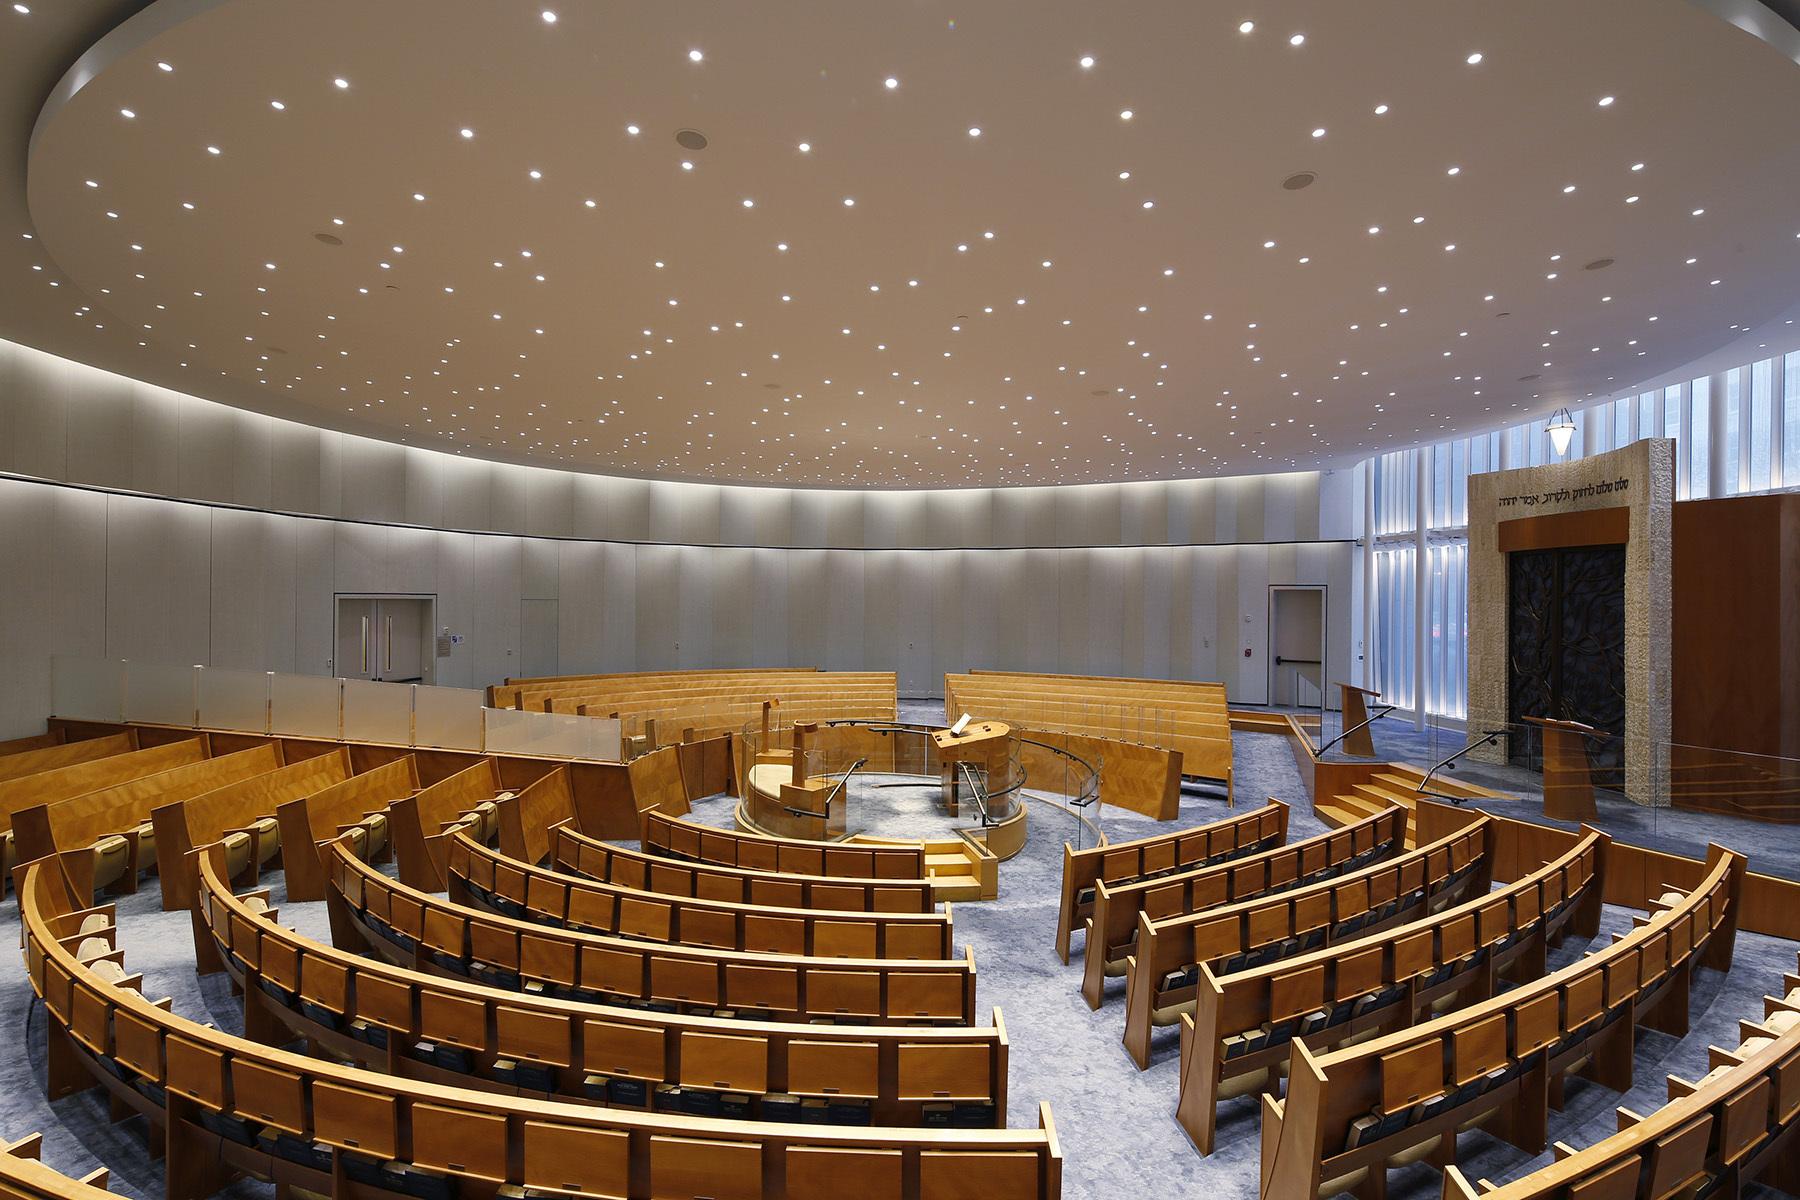 Synagogue Lincoln square, New York, US - Architecte : Cetra Ruddy - Conception lumière : Tillotson Design Associates © David Sundberg, Esto Photographics Inc